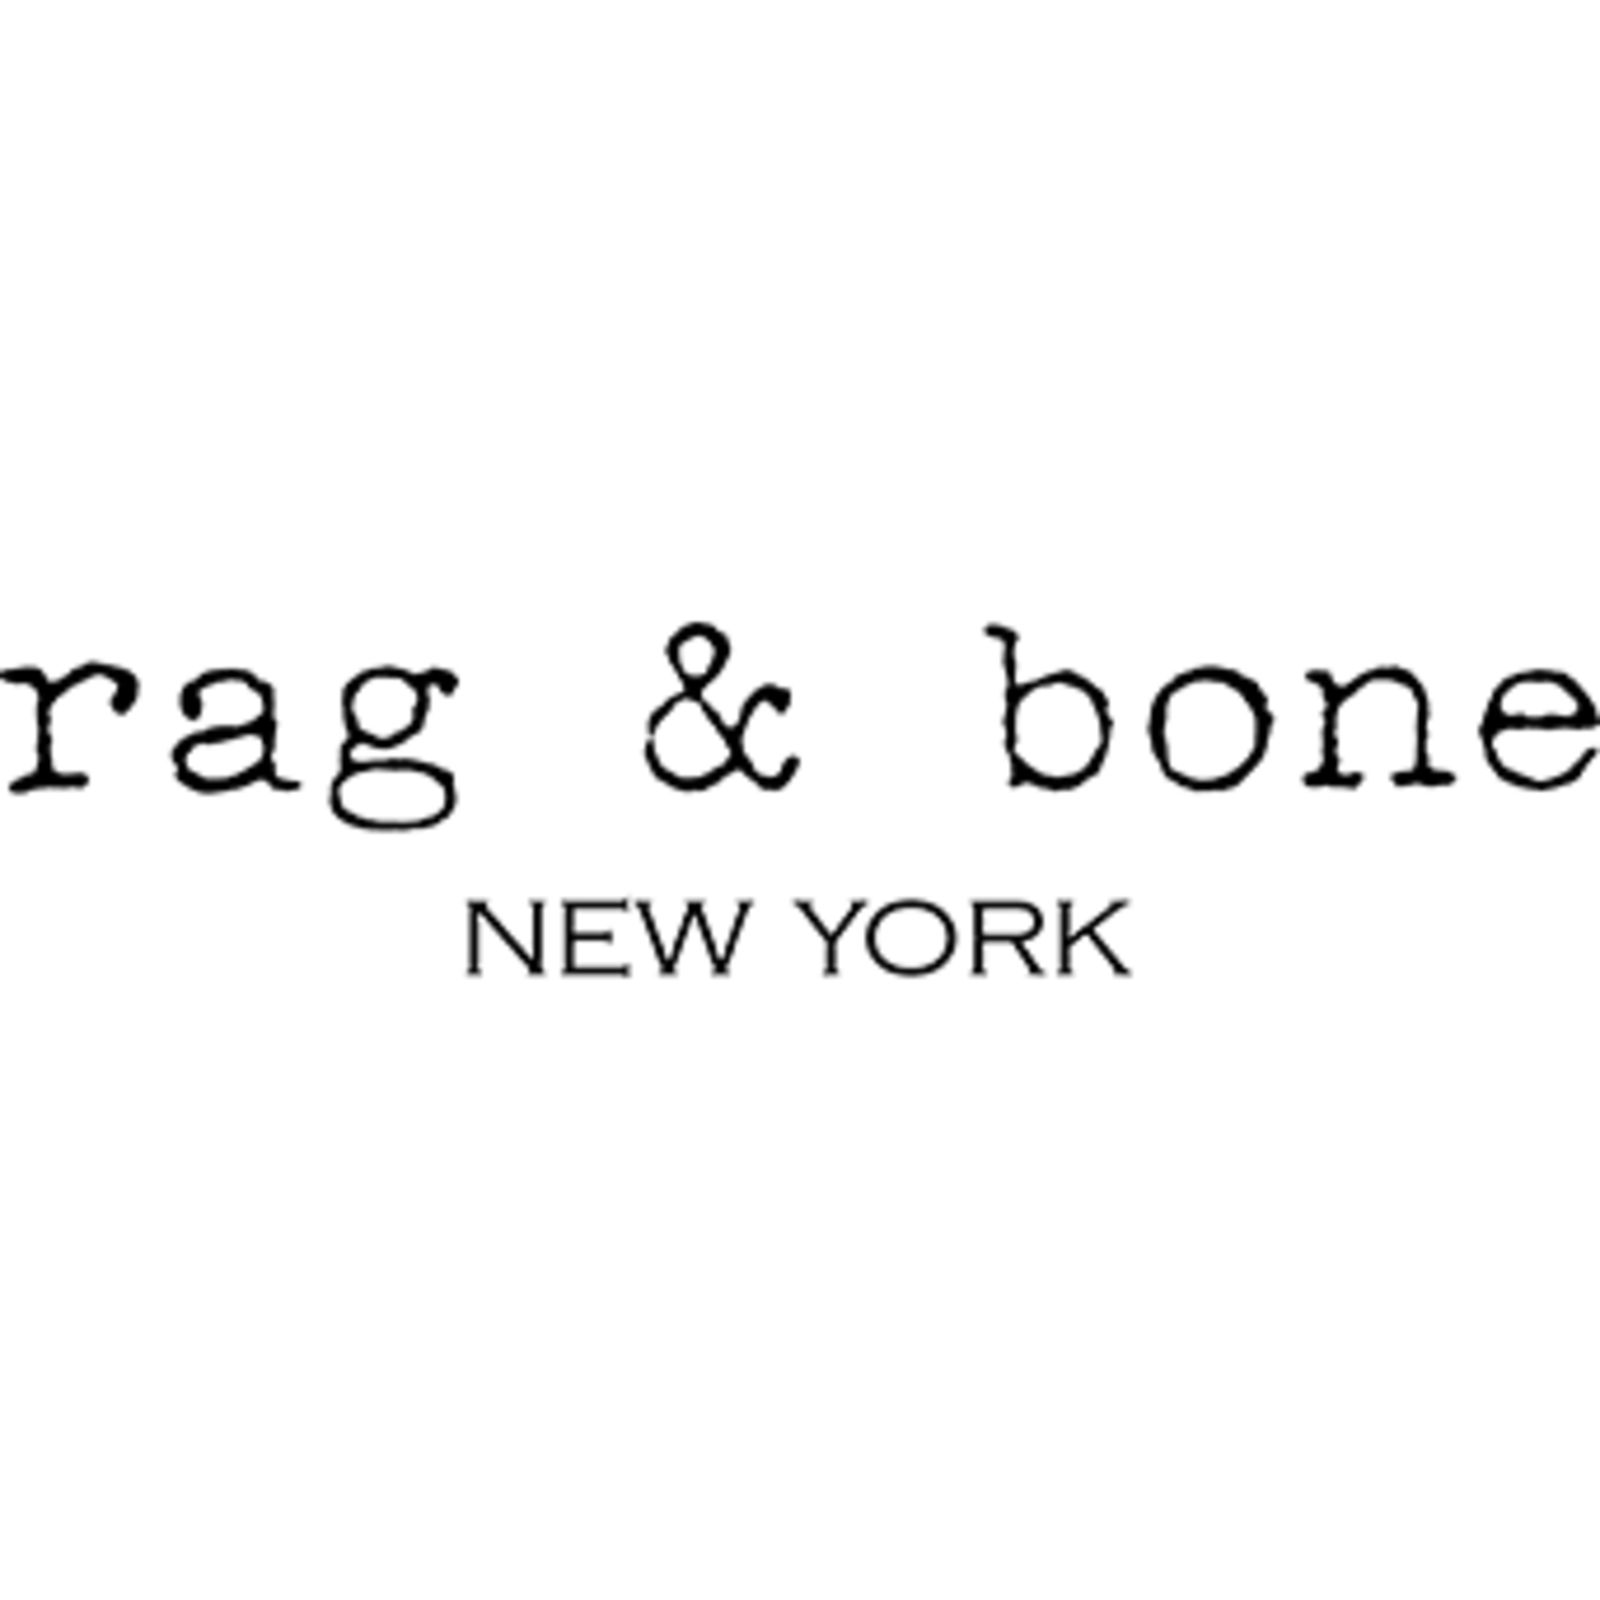 rag & bone (Image 1)